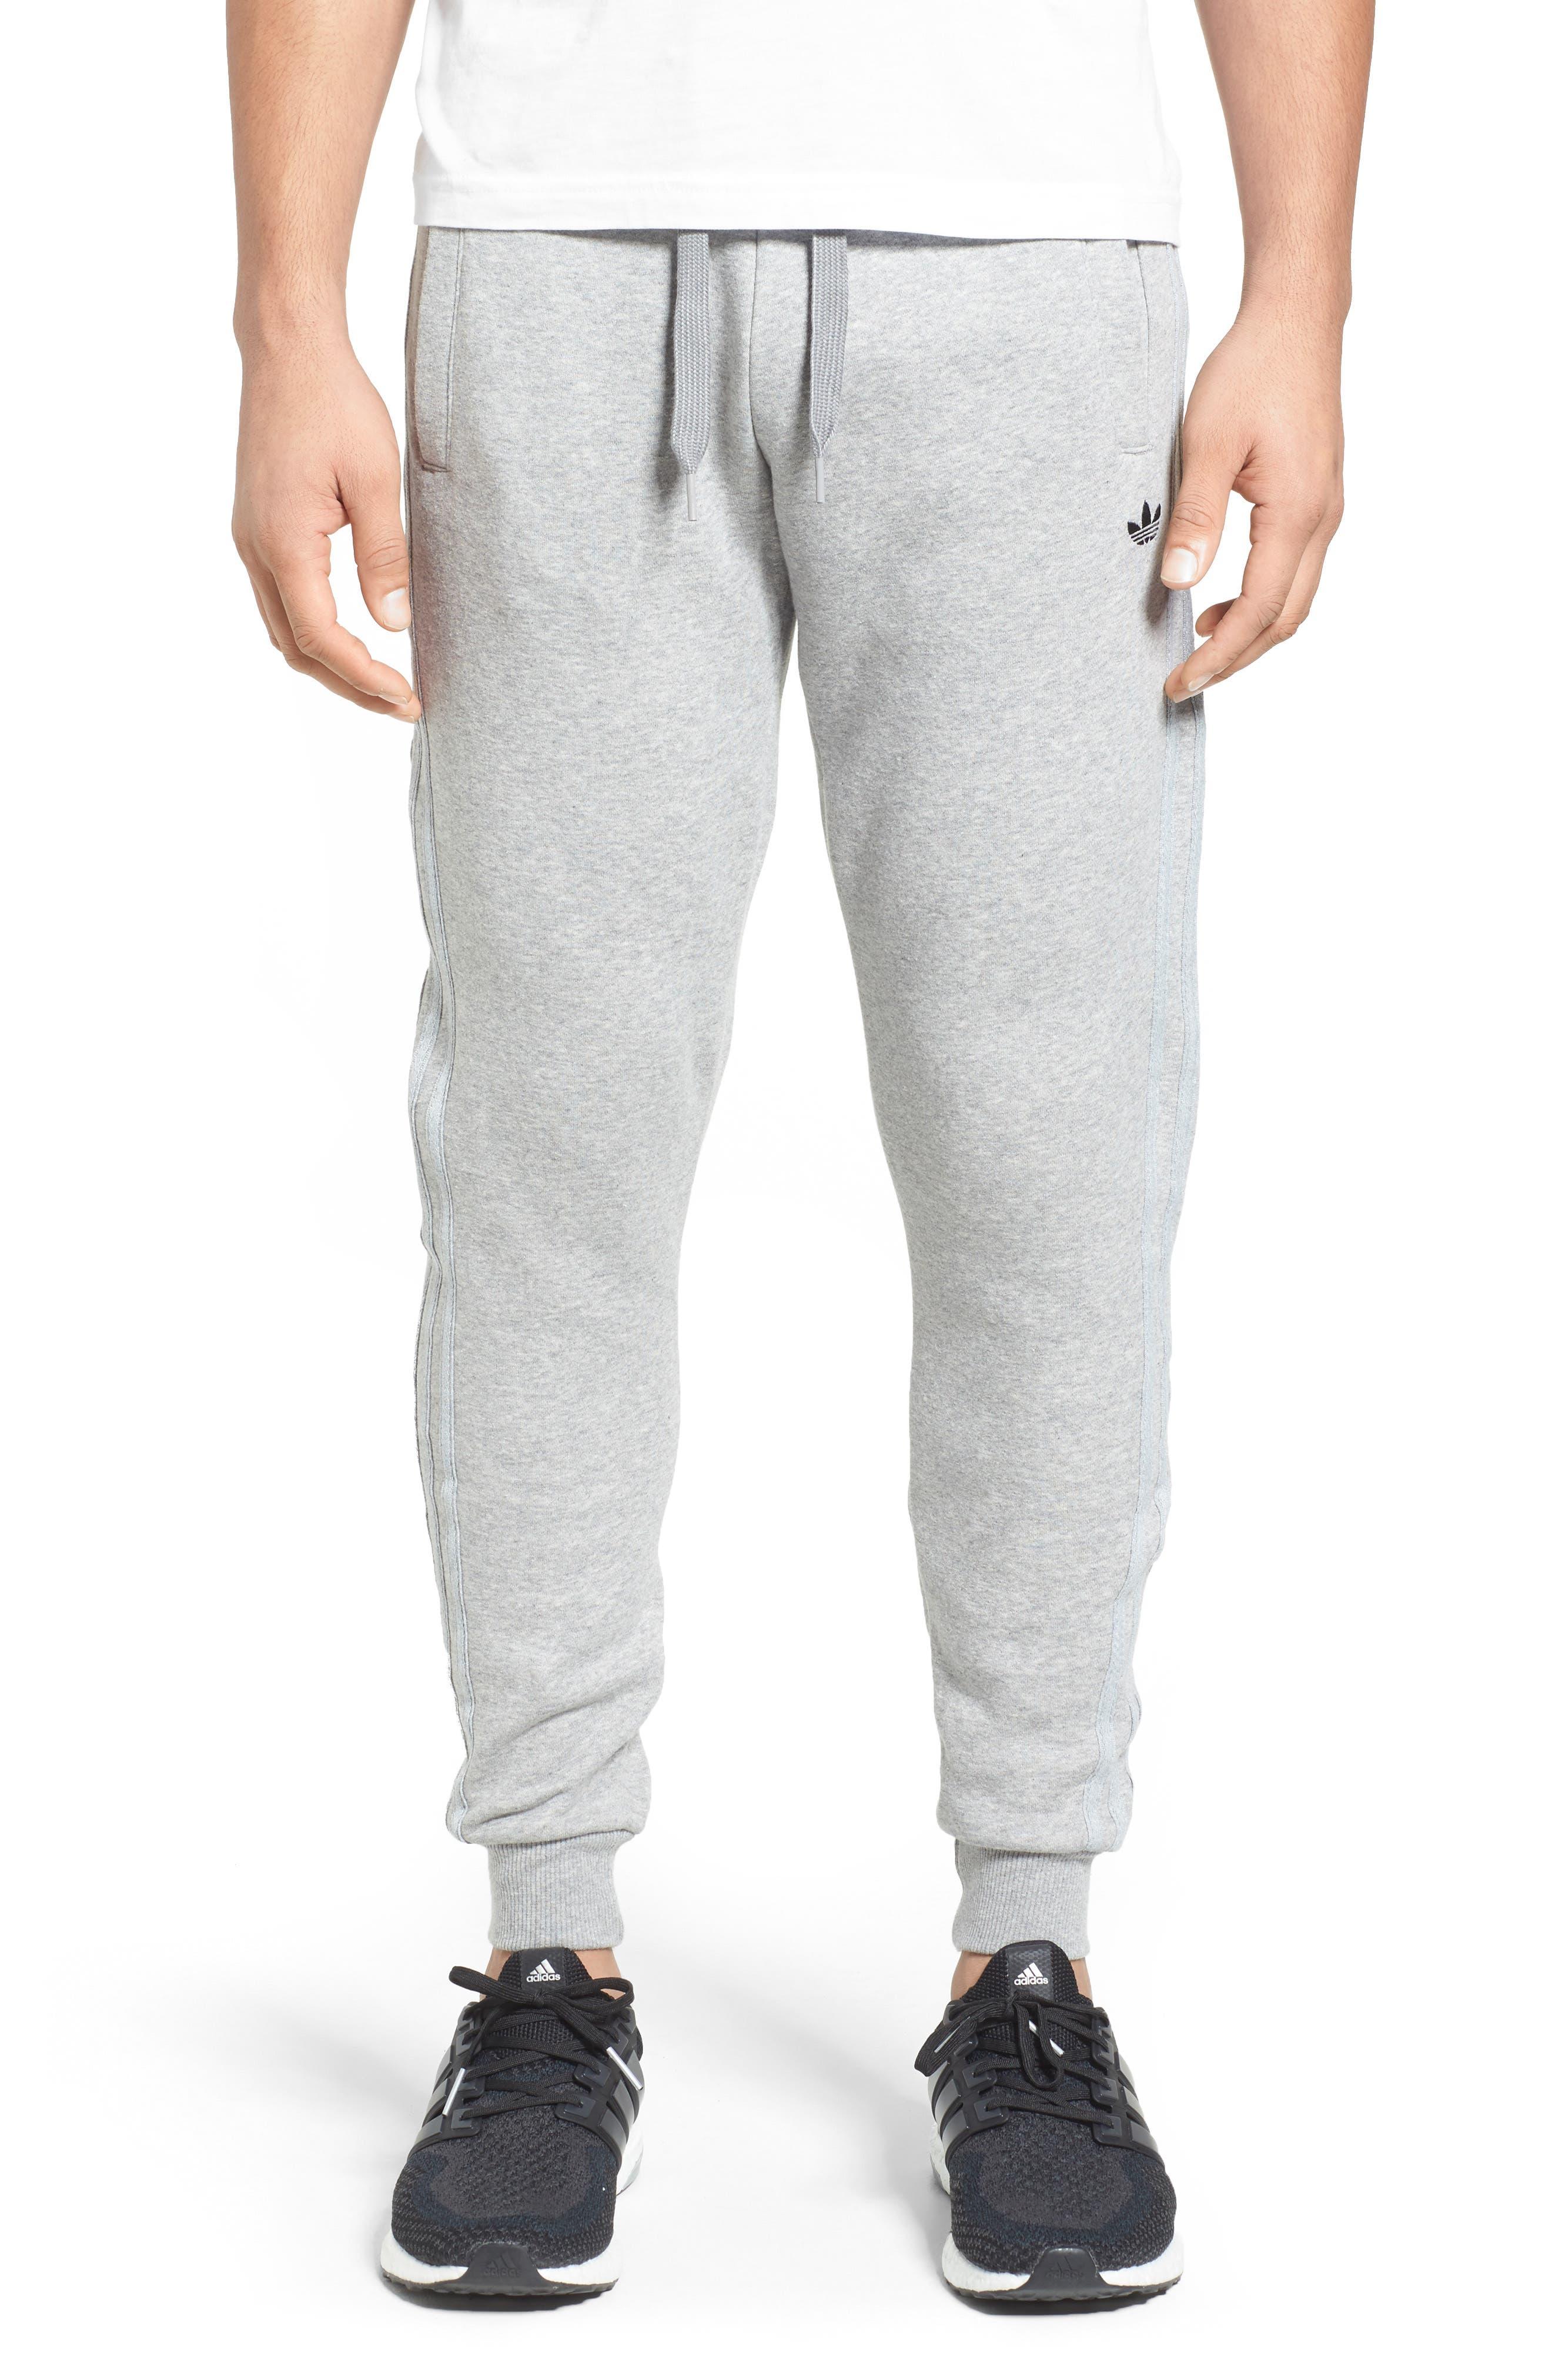 Alternate Image 1 Selected - adidas Originals Tapered Fit Sweatpants